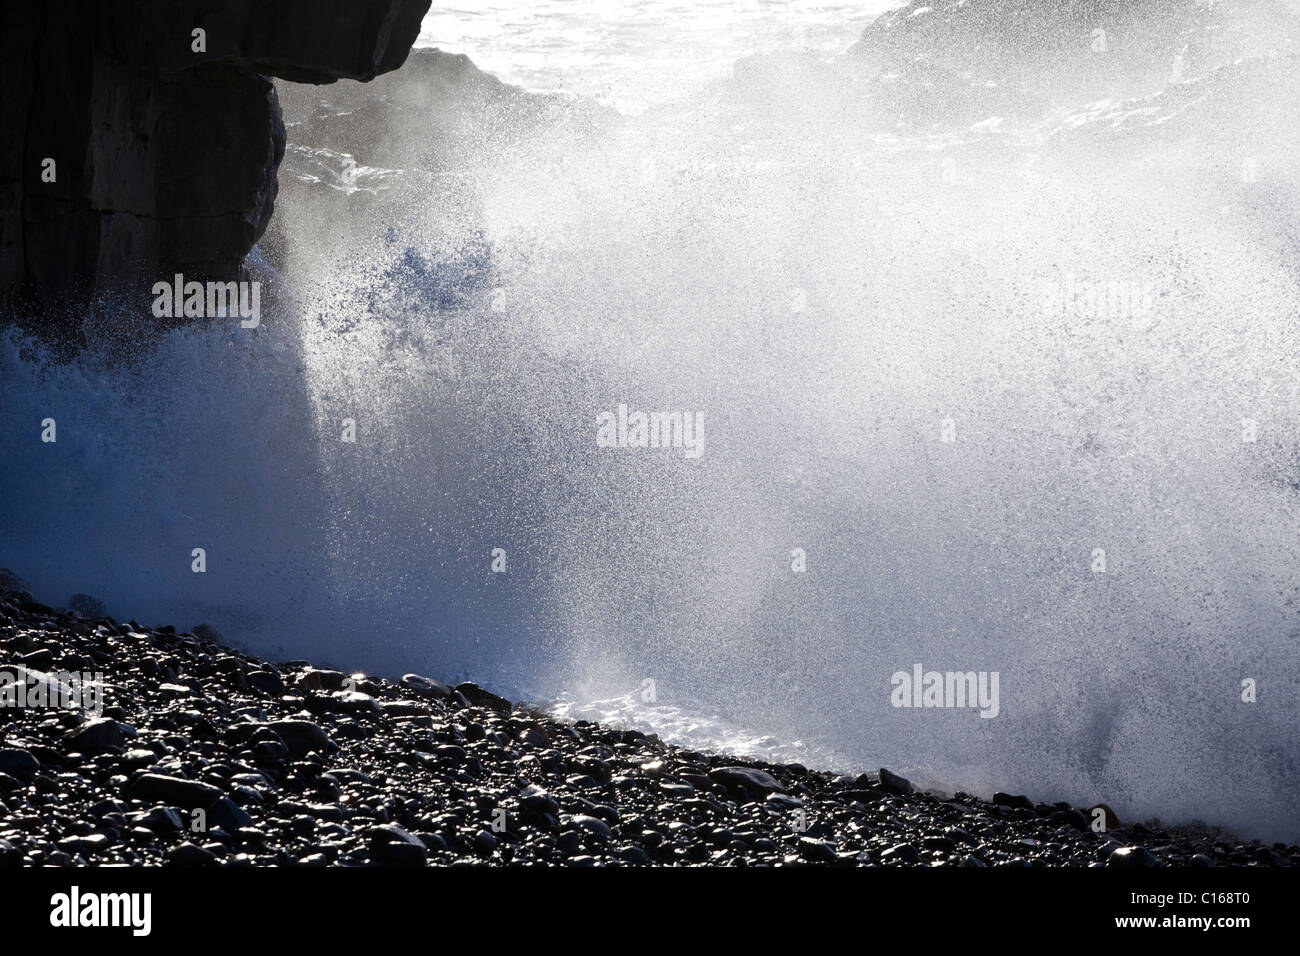 Heavy Atlantic seas with large waves crashing onto rocks at Ajuy on the Canary Island of Fuerteventura - Stock Image